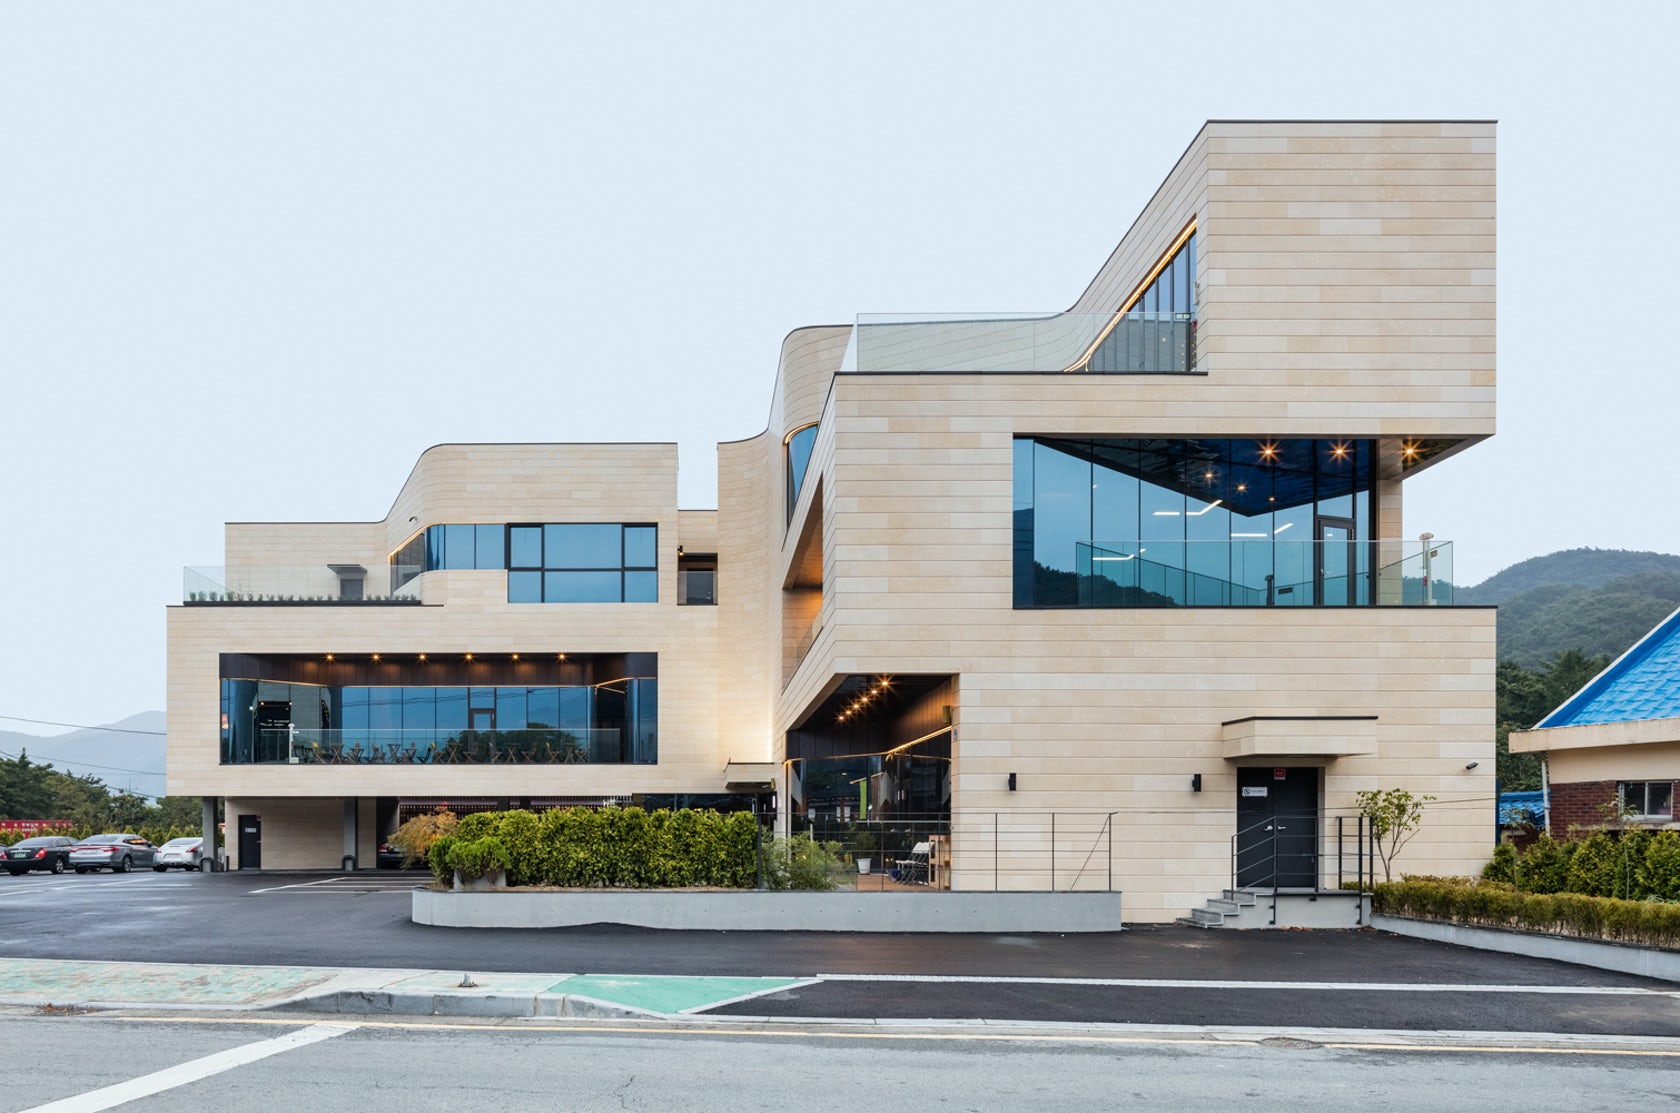 JOHO Architecture On Architizer - Curving house joho architecture